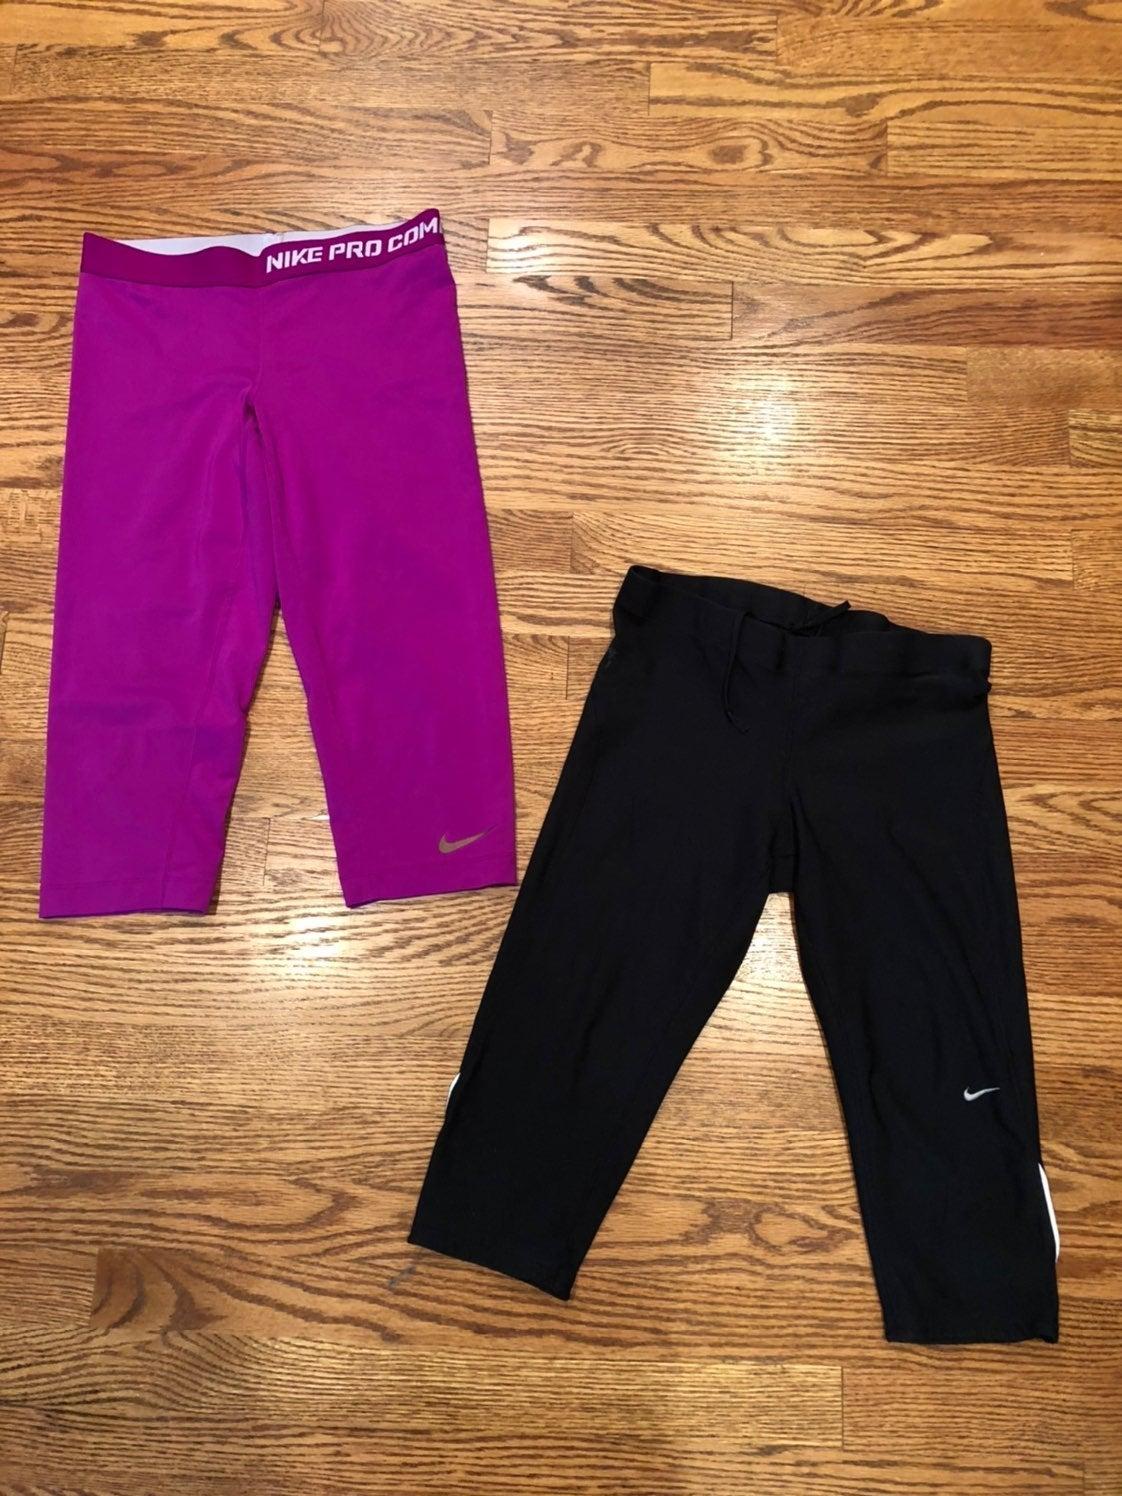 Lot if 2 Nike leggings